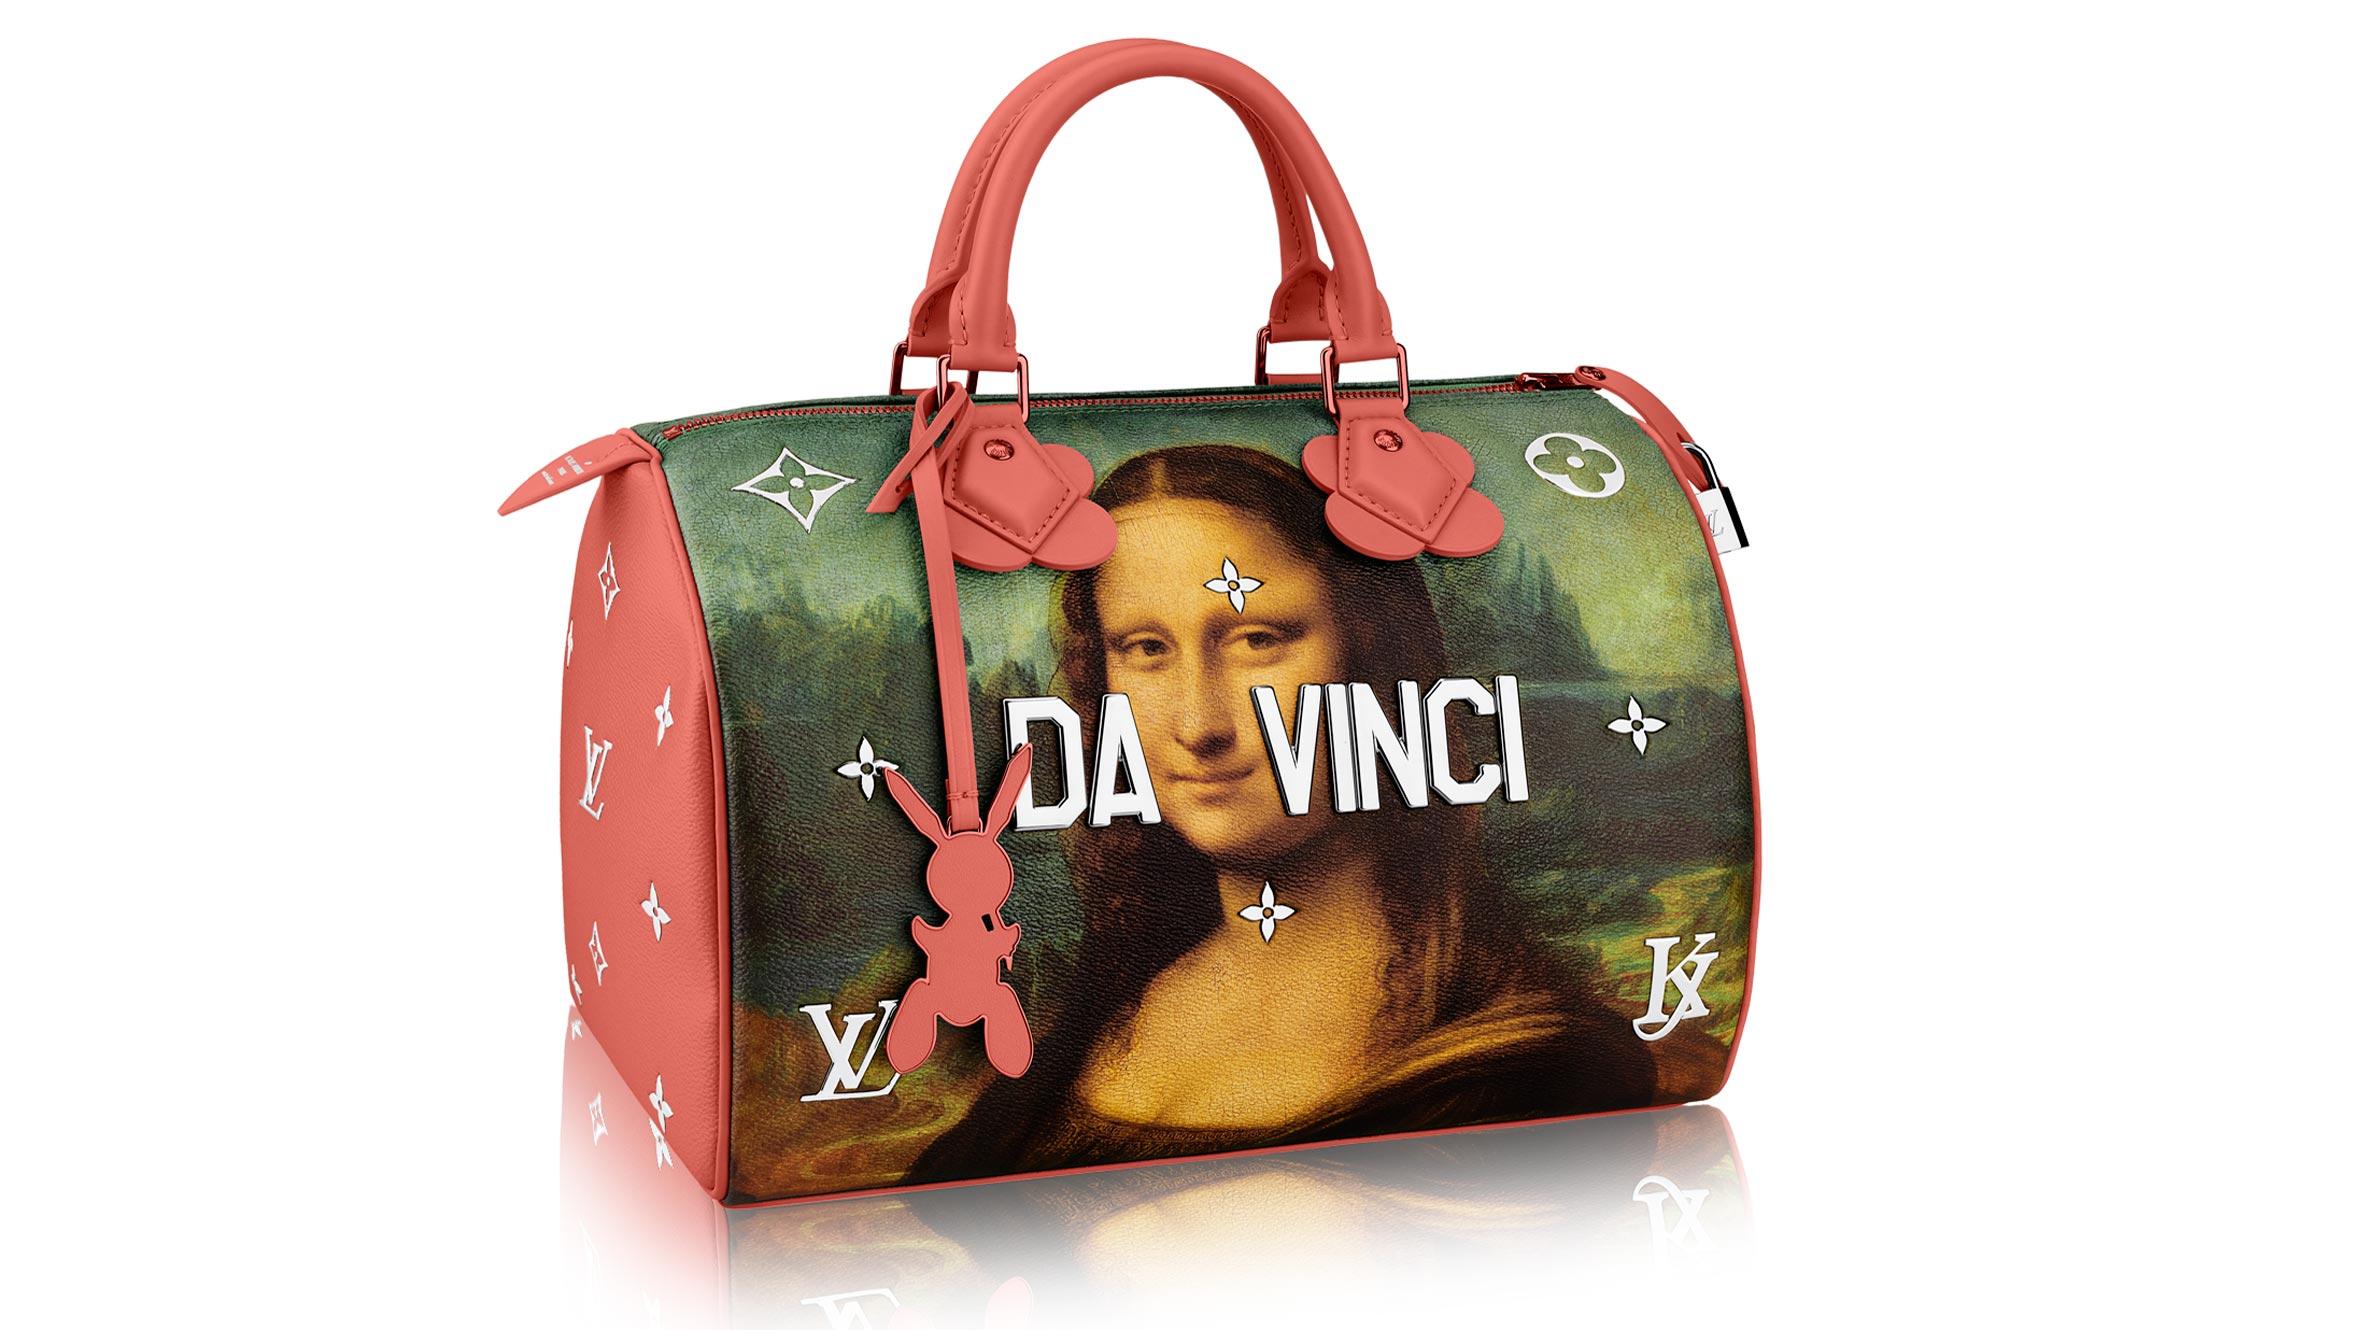 Louis Vuitton's latest collaboration with artist Jeff Koons interpreting Da Vinci's Mona Lisa.jpg